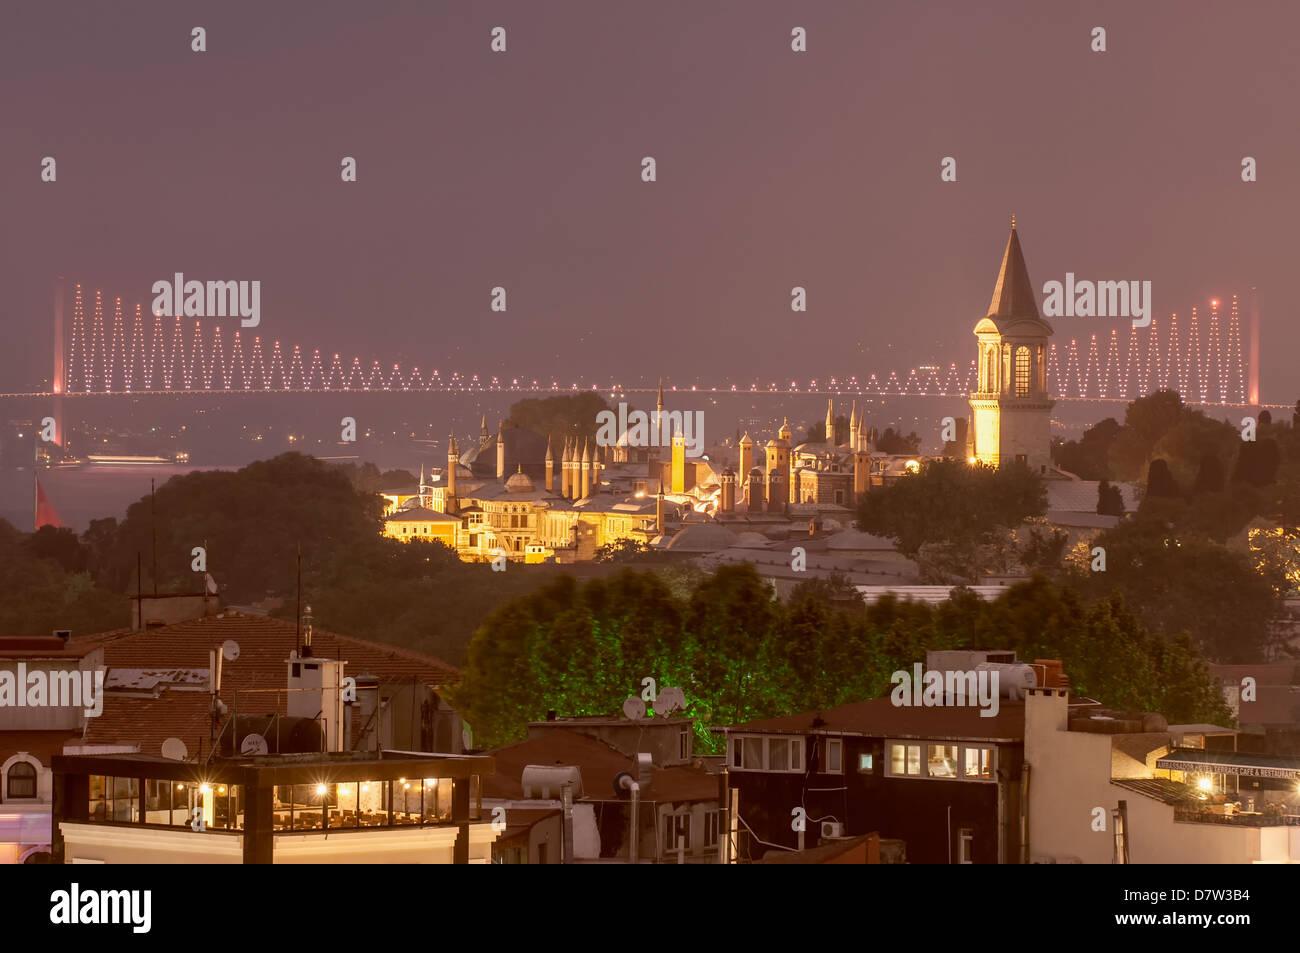 Topkapi Palace and Bosphorus bridge at night, Istanbul, Turkey - Stock Image